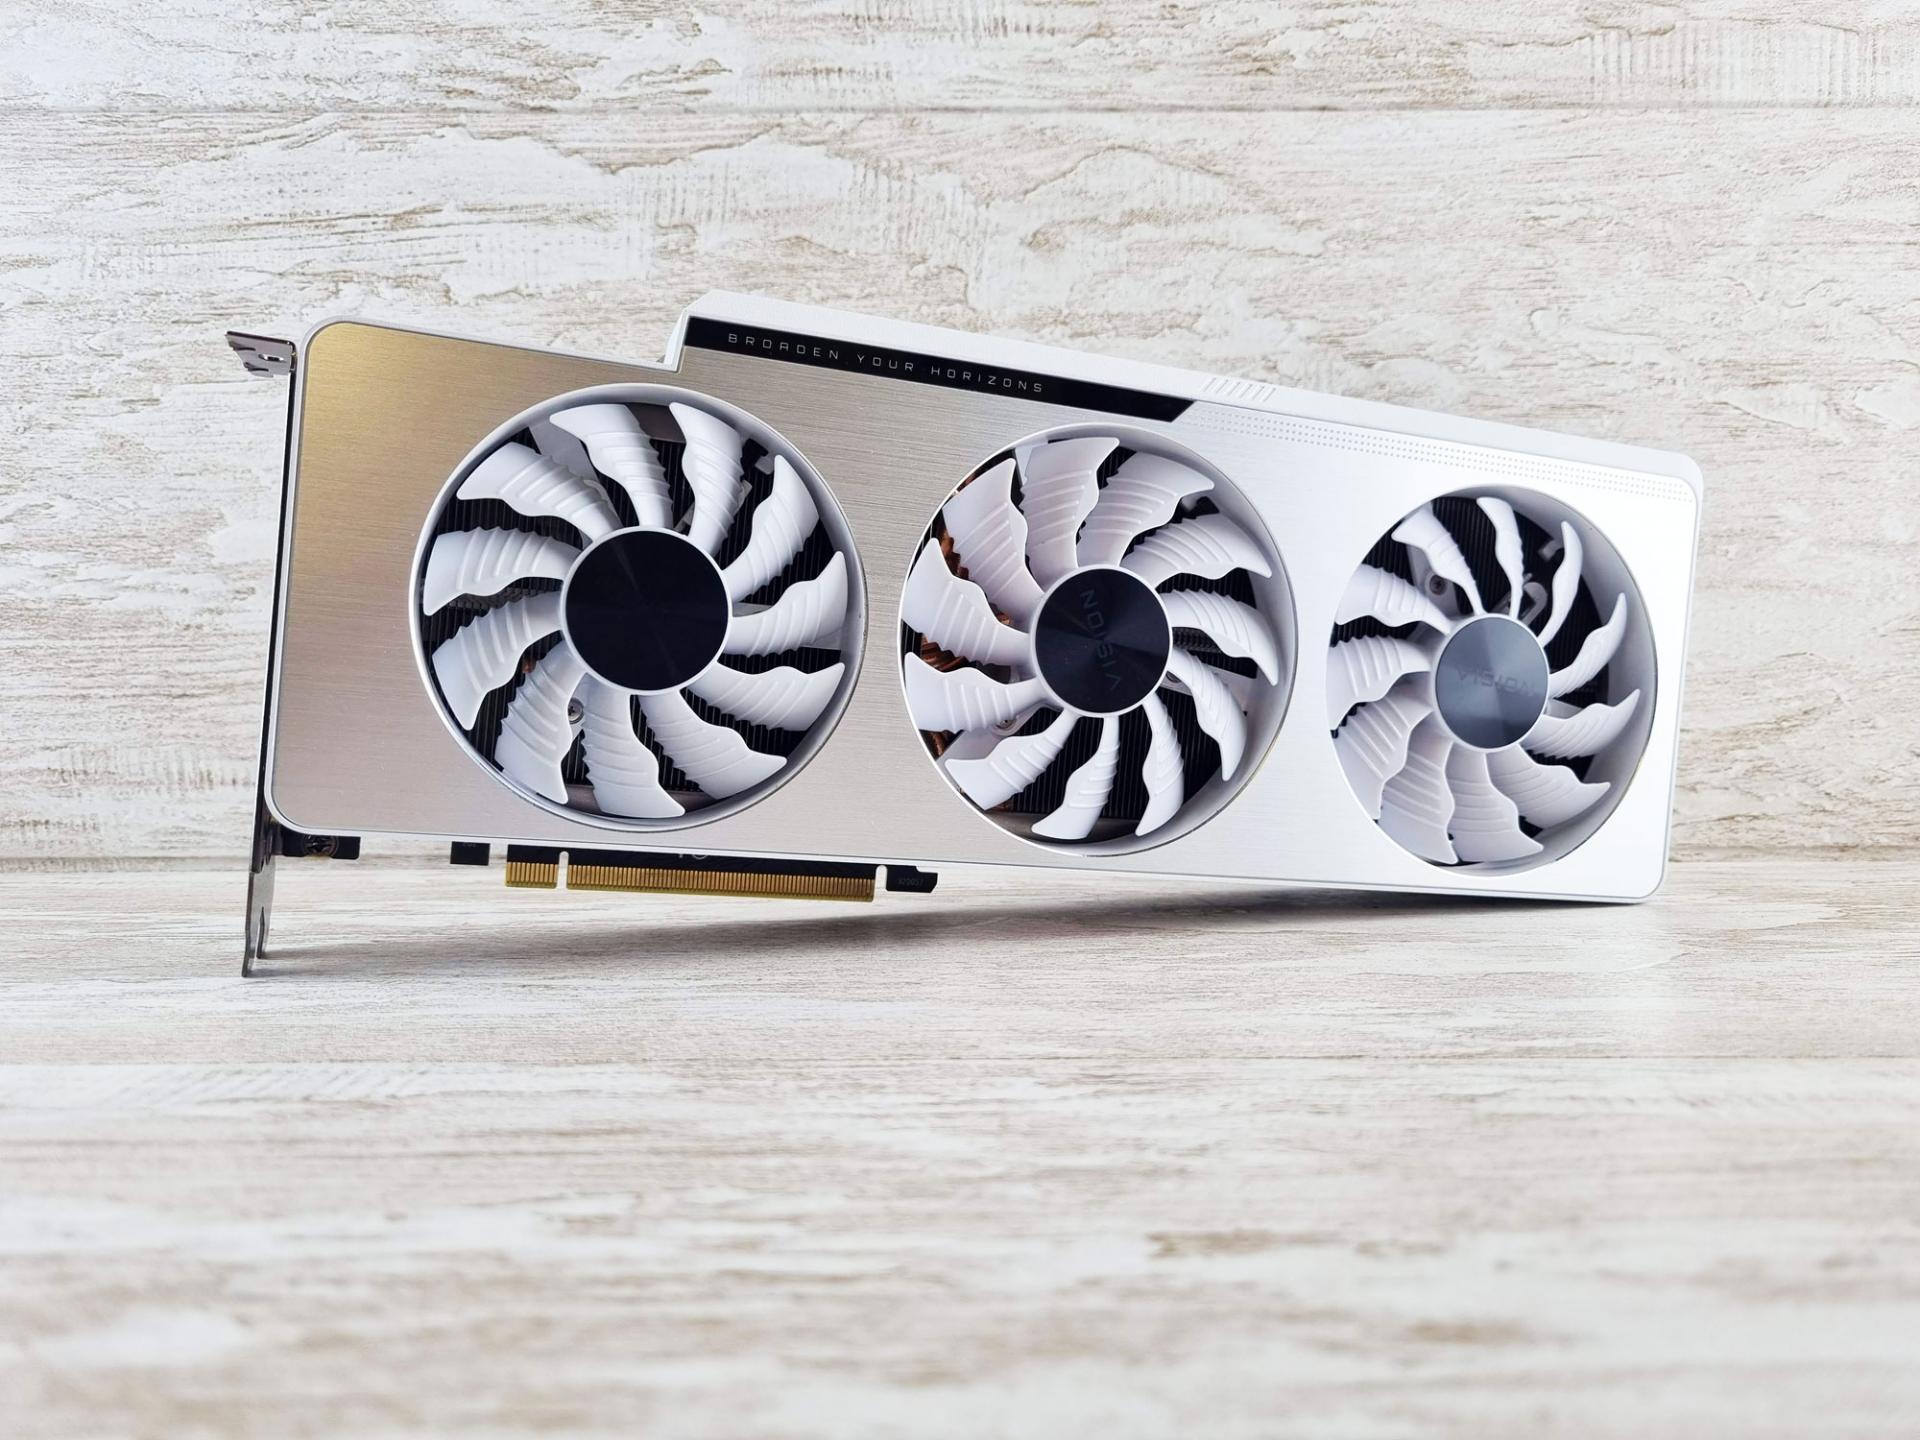 Тест-драйв видеокарты GIGABYTE GeForce RTX 3080 Ti VISION OC 12G